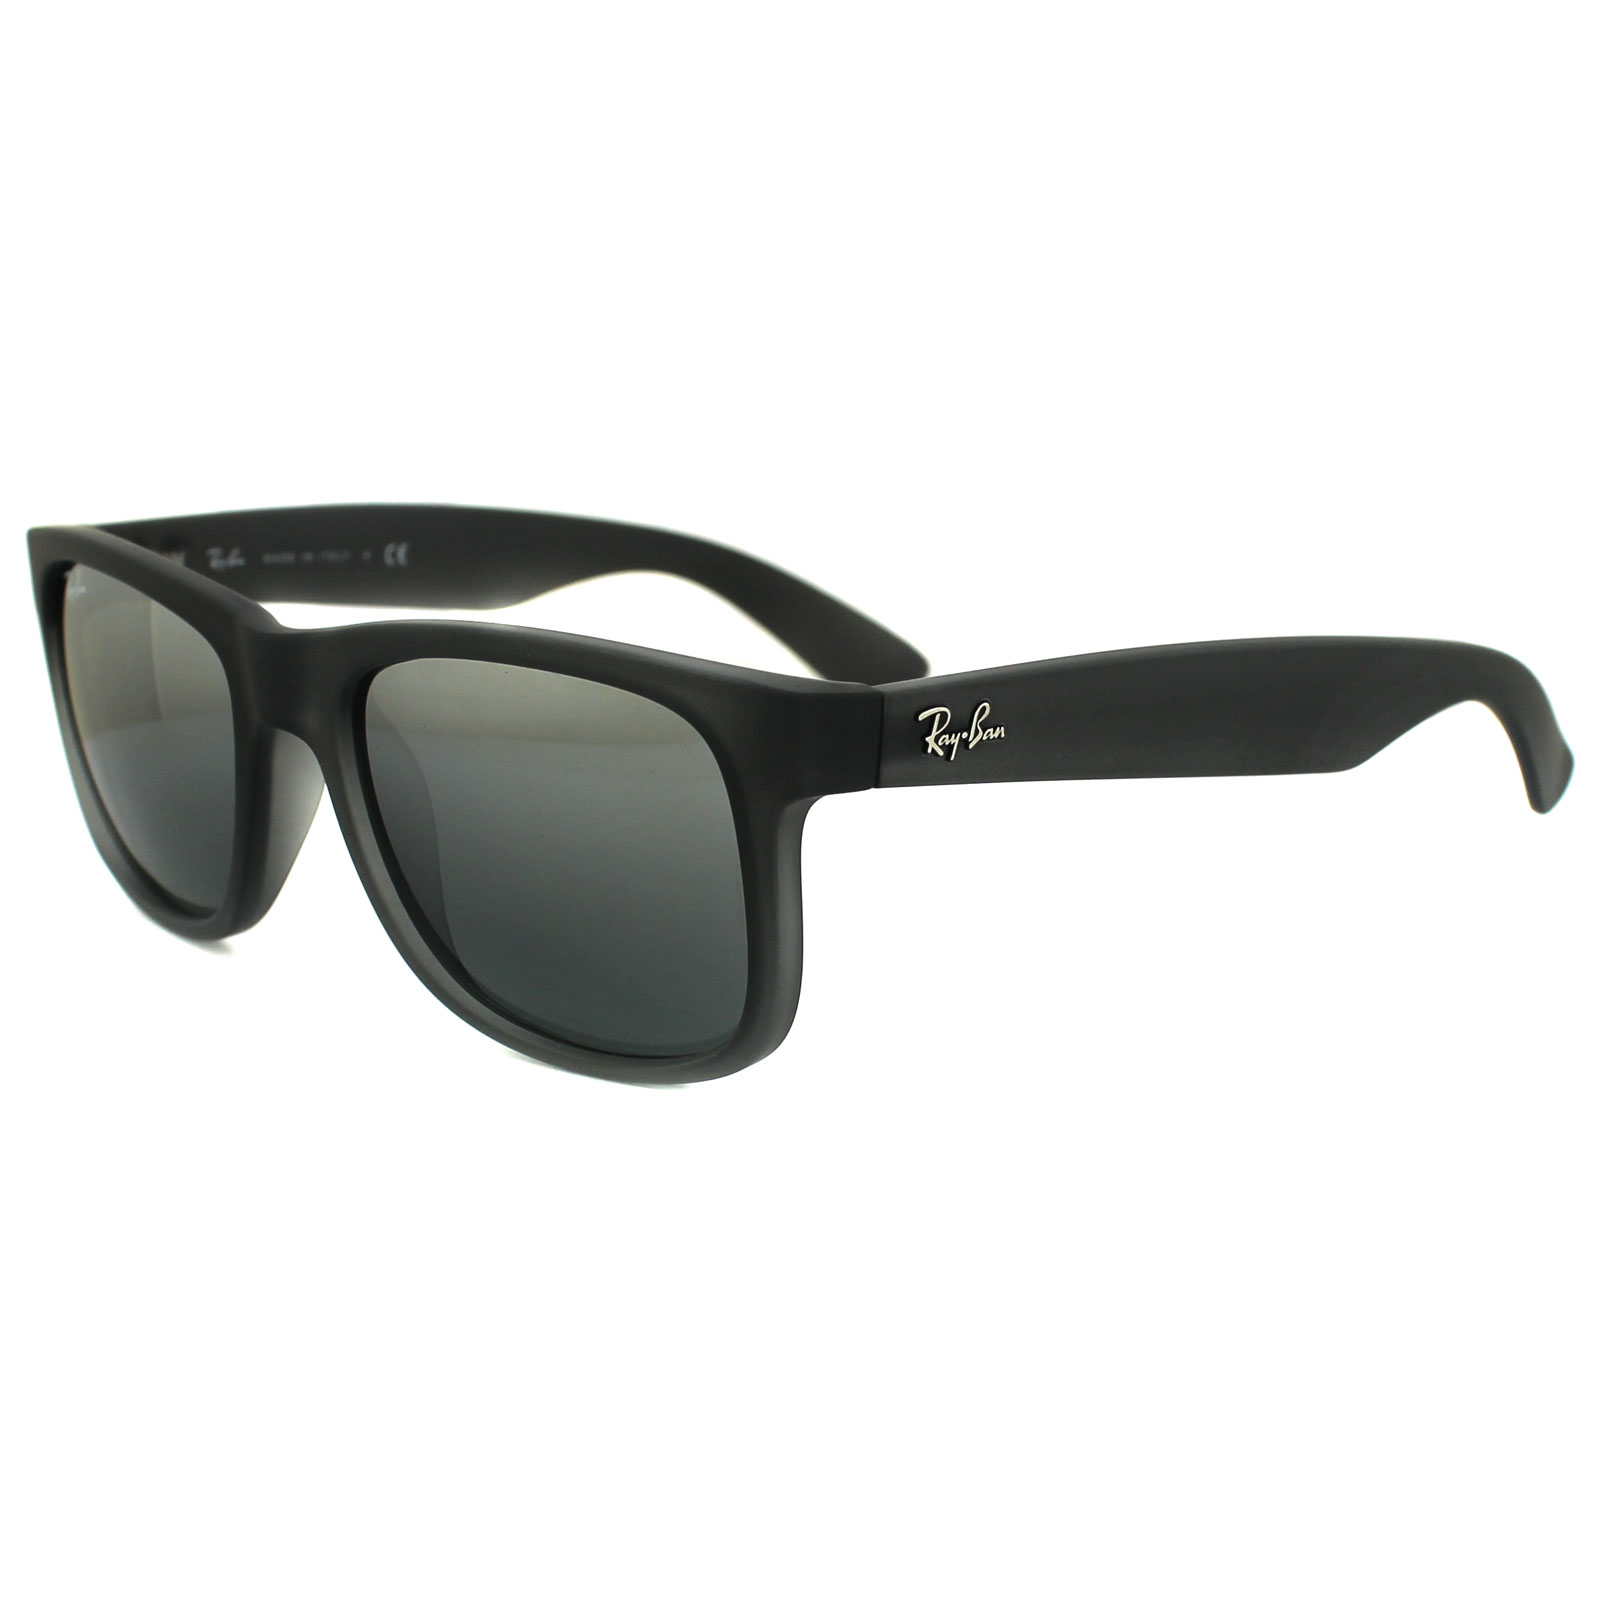 Sentinel RayBan Sunglasses Justin 4165 852 88 Rubber Grey Grey Silver  Mirror Gradient f52b293b1f